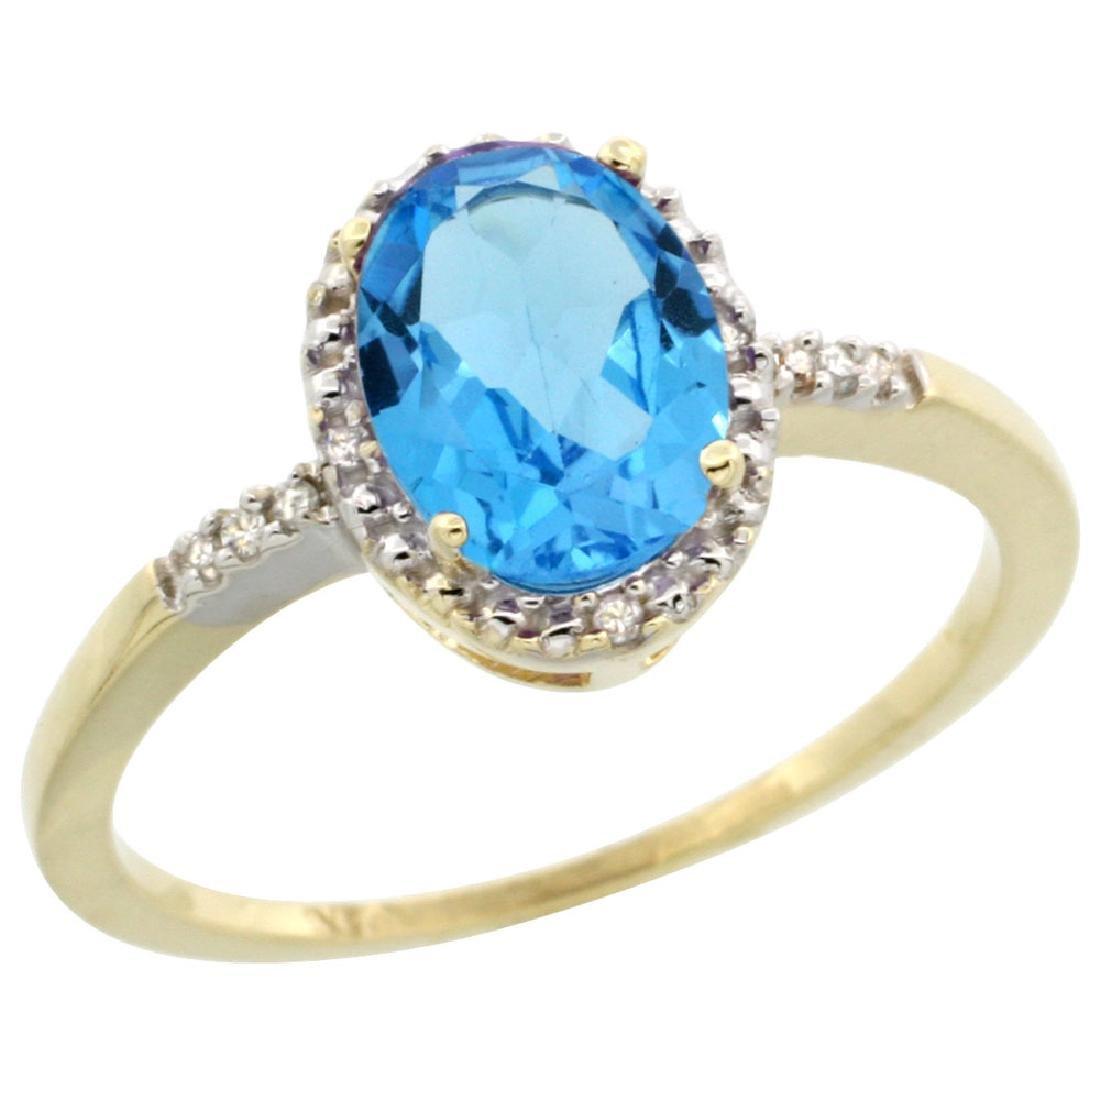 Natural 1.2 ctw Swiss-blue-topaz & Diamond Engagement